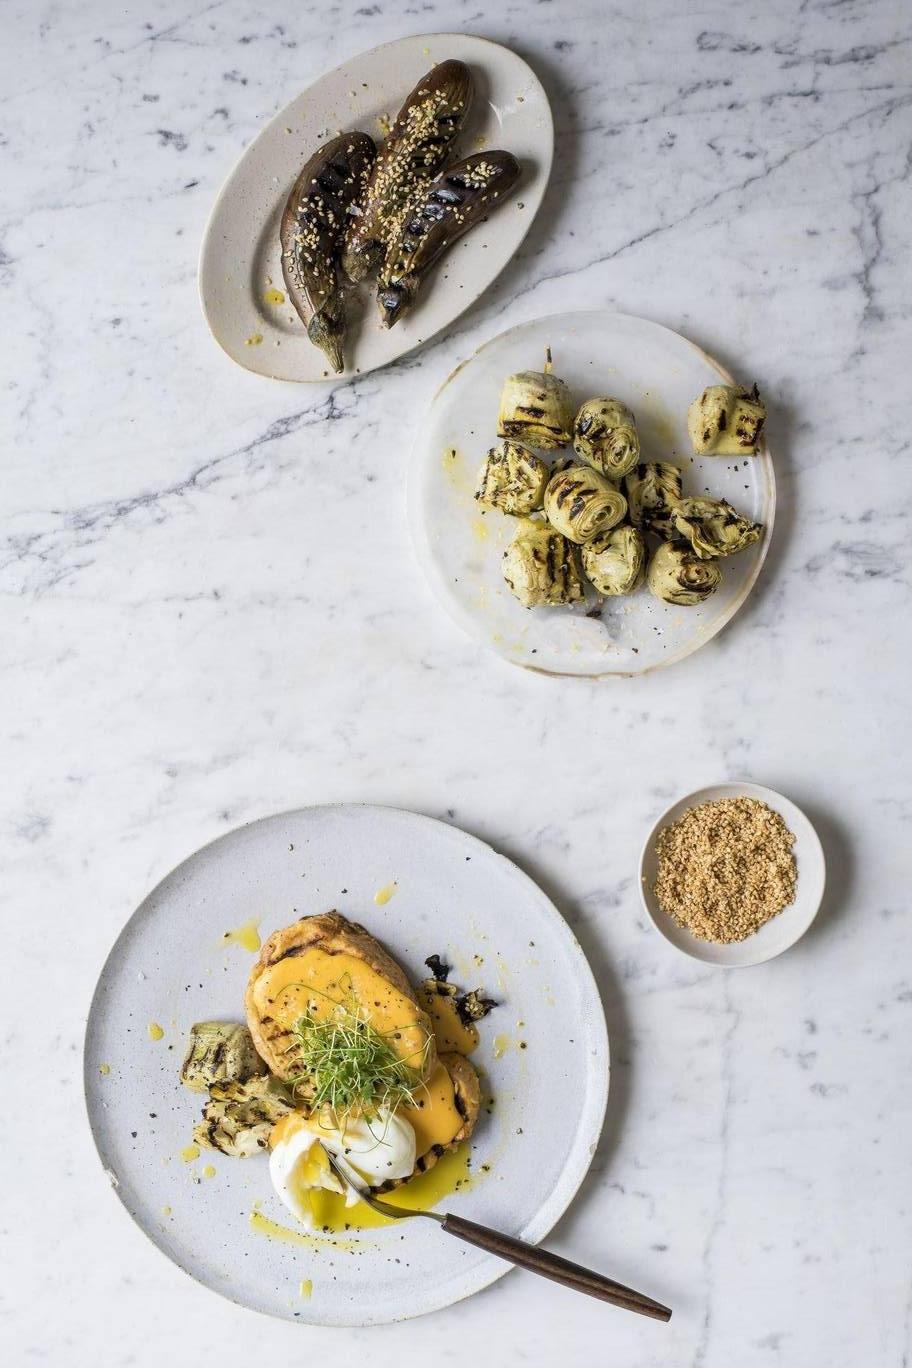 Evening standard: the ultimate indulgent veggie weekend brunch